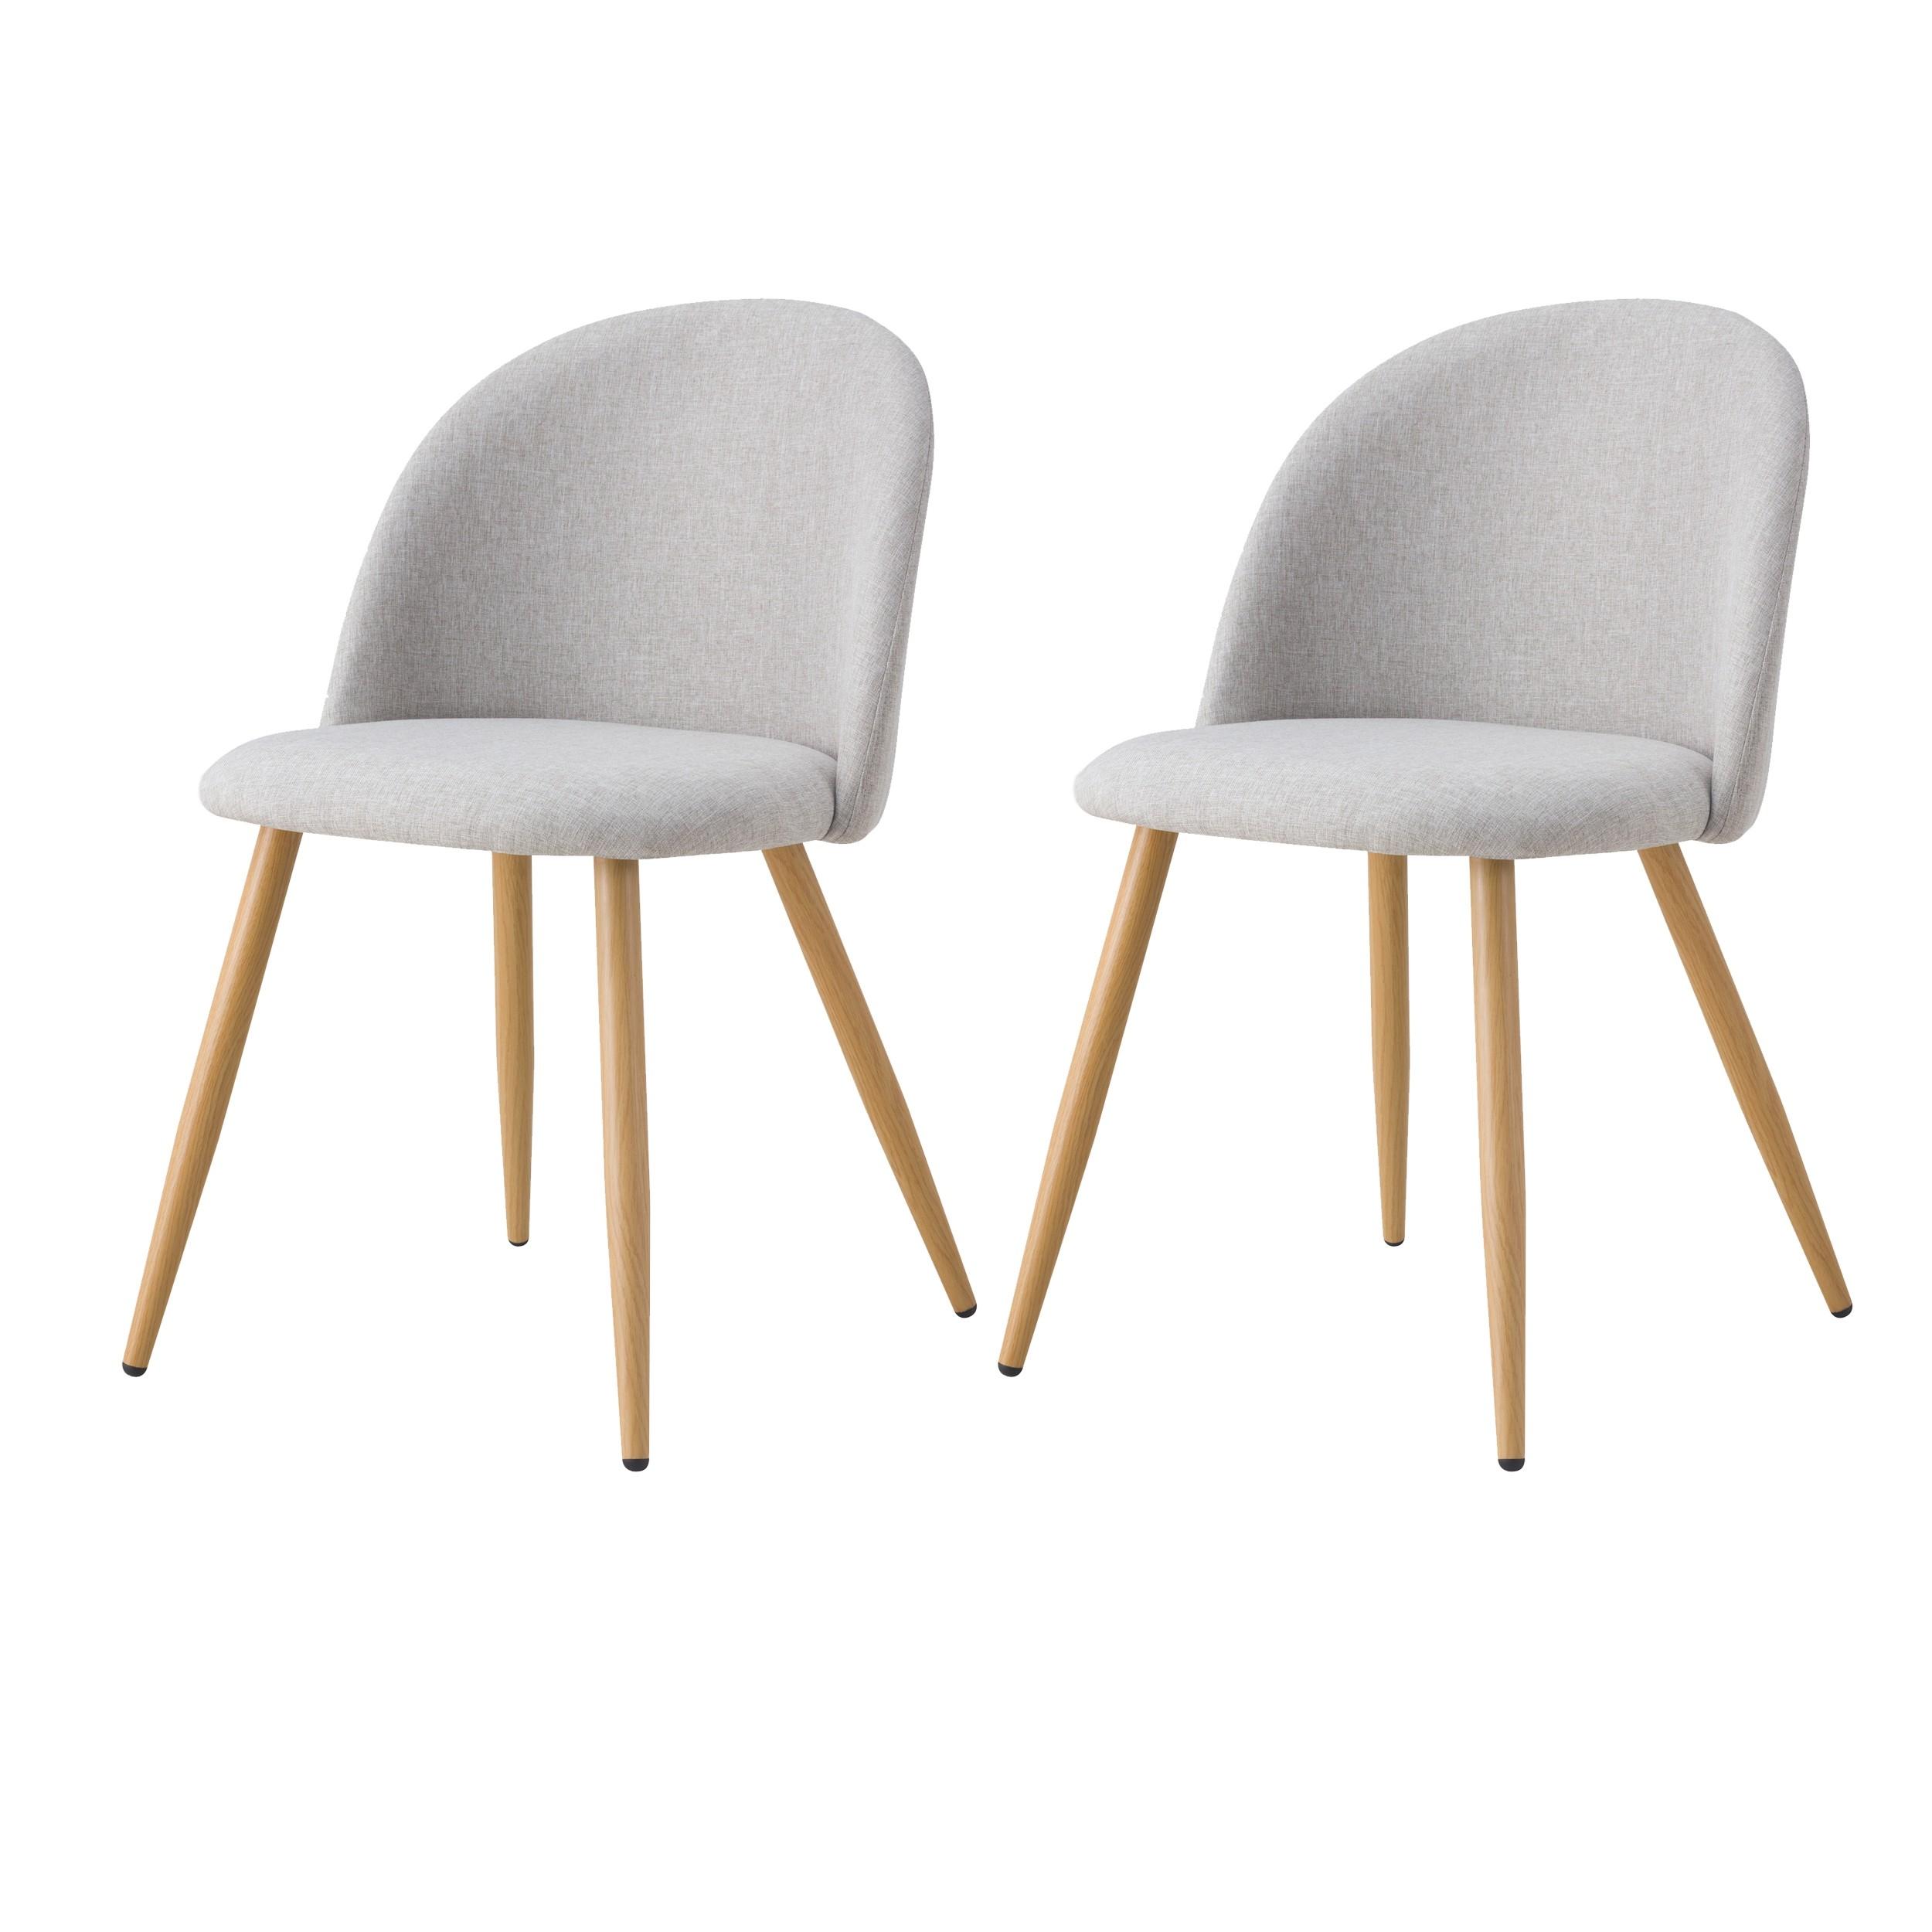 acheter chaise lot de 2 scandi